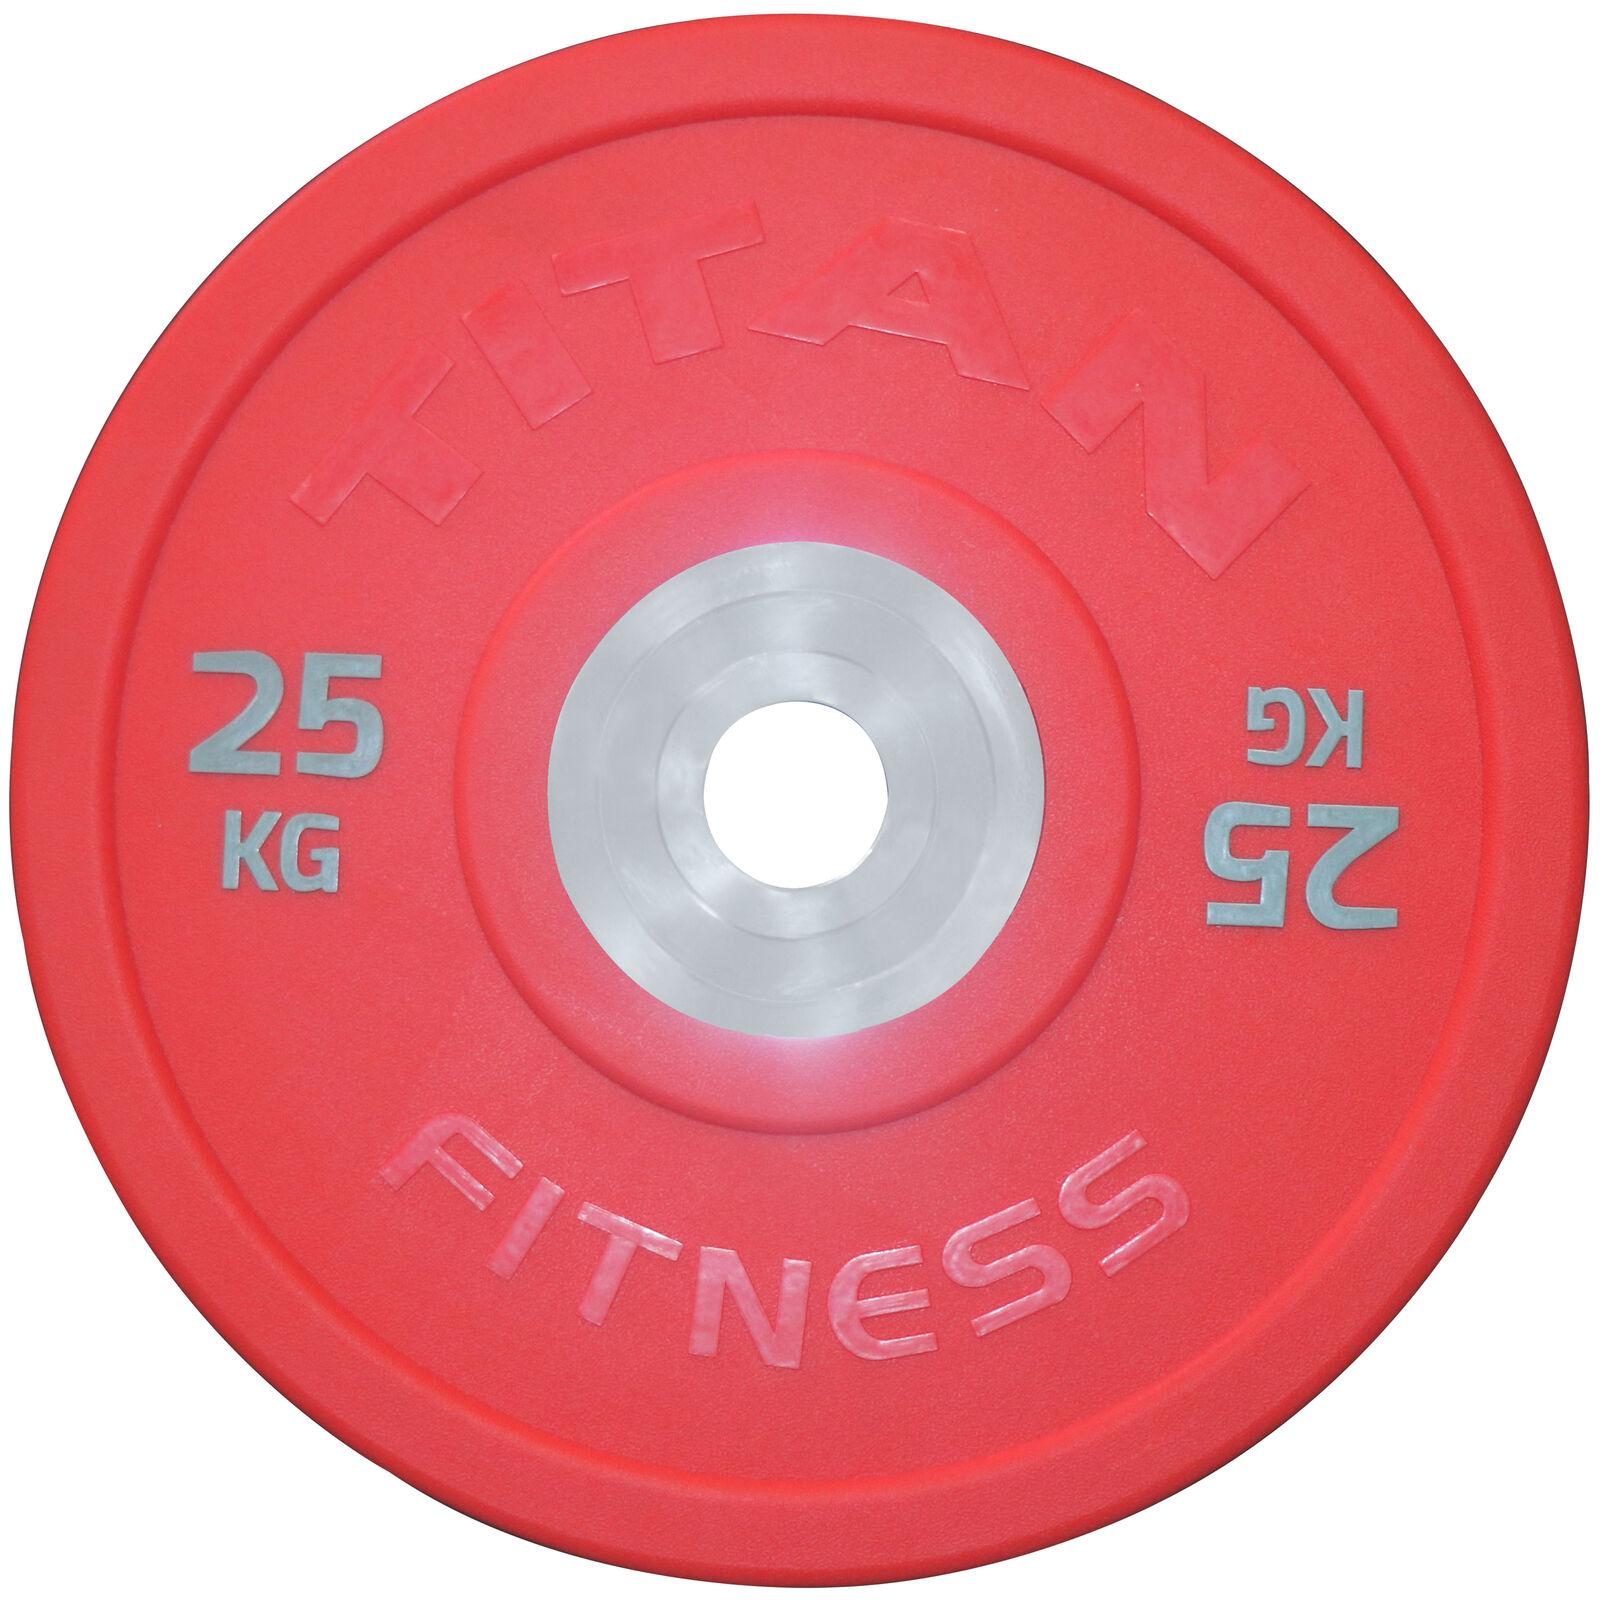 Titan Urethane Bumper Plates   color    25 KG Single  80% off